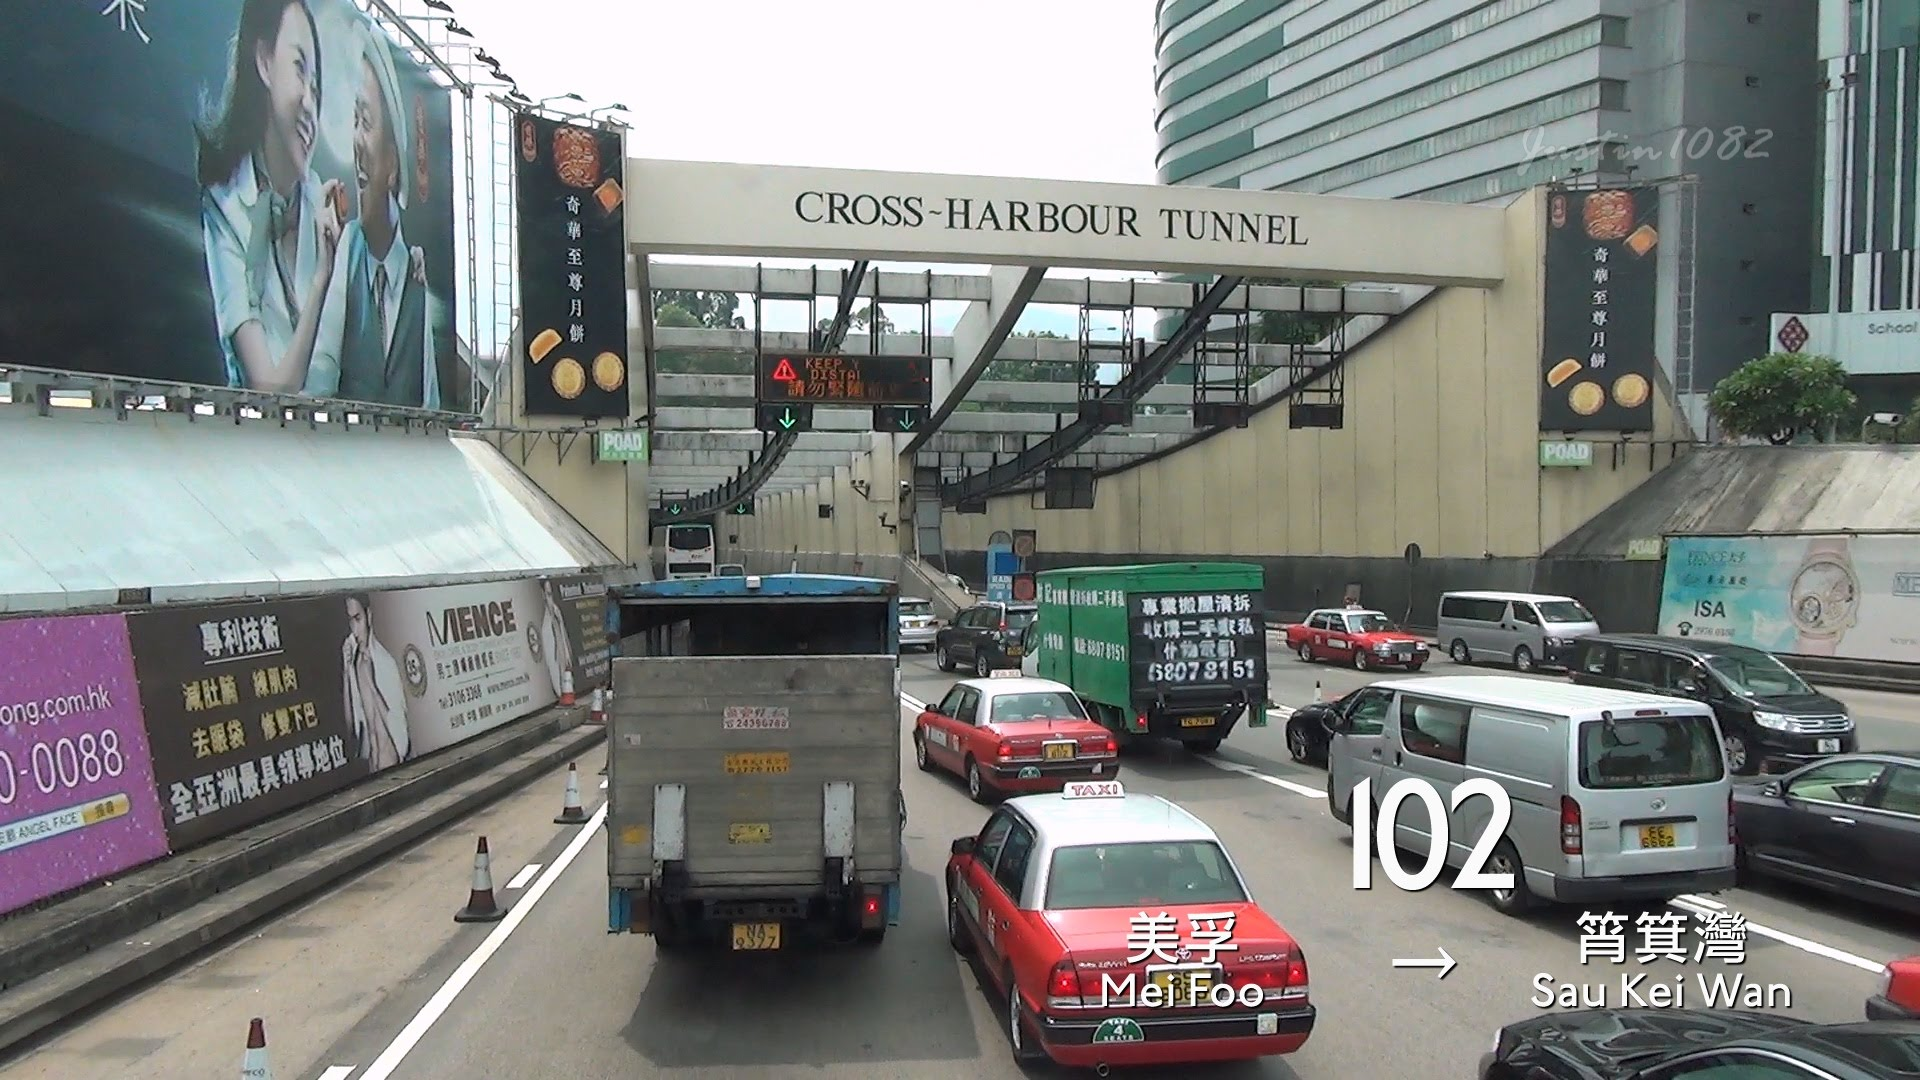 [Hong Kong Bus Ride] 九巴 ATENU535 @ 102 美孚 – 筲箕灣 [全程行車影片]